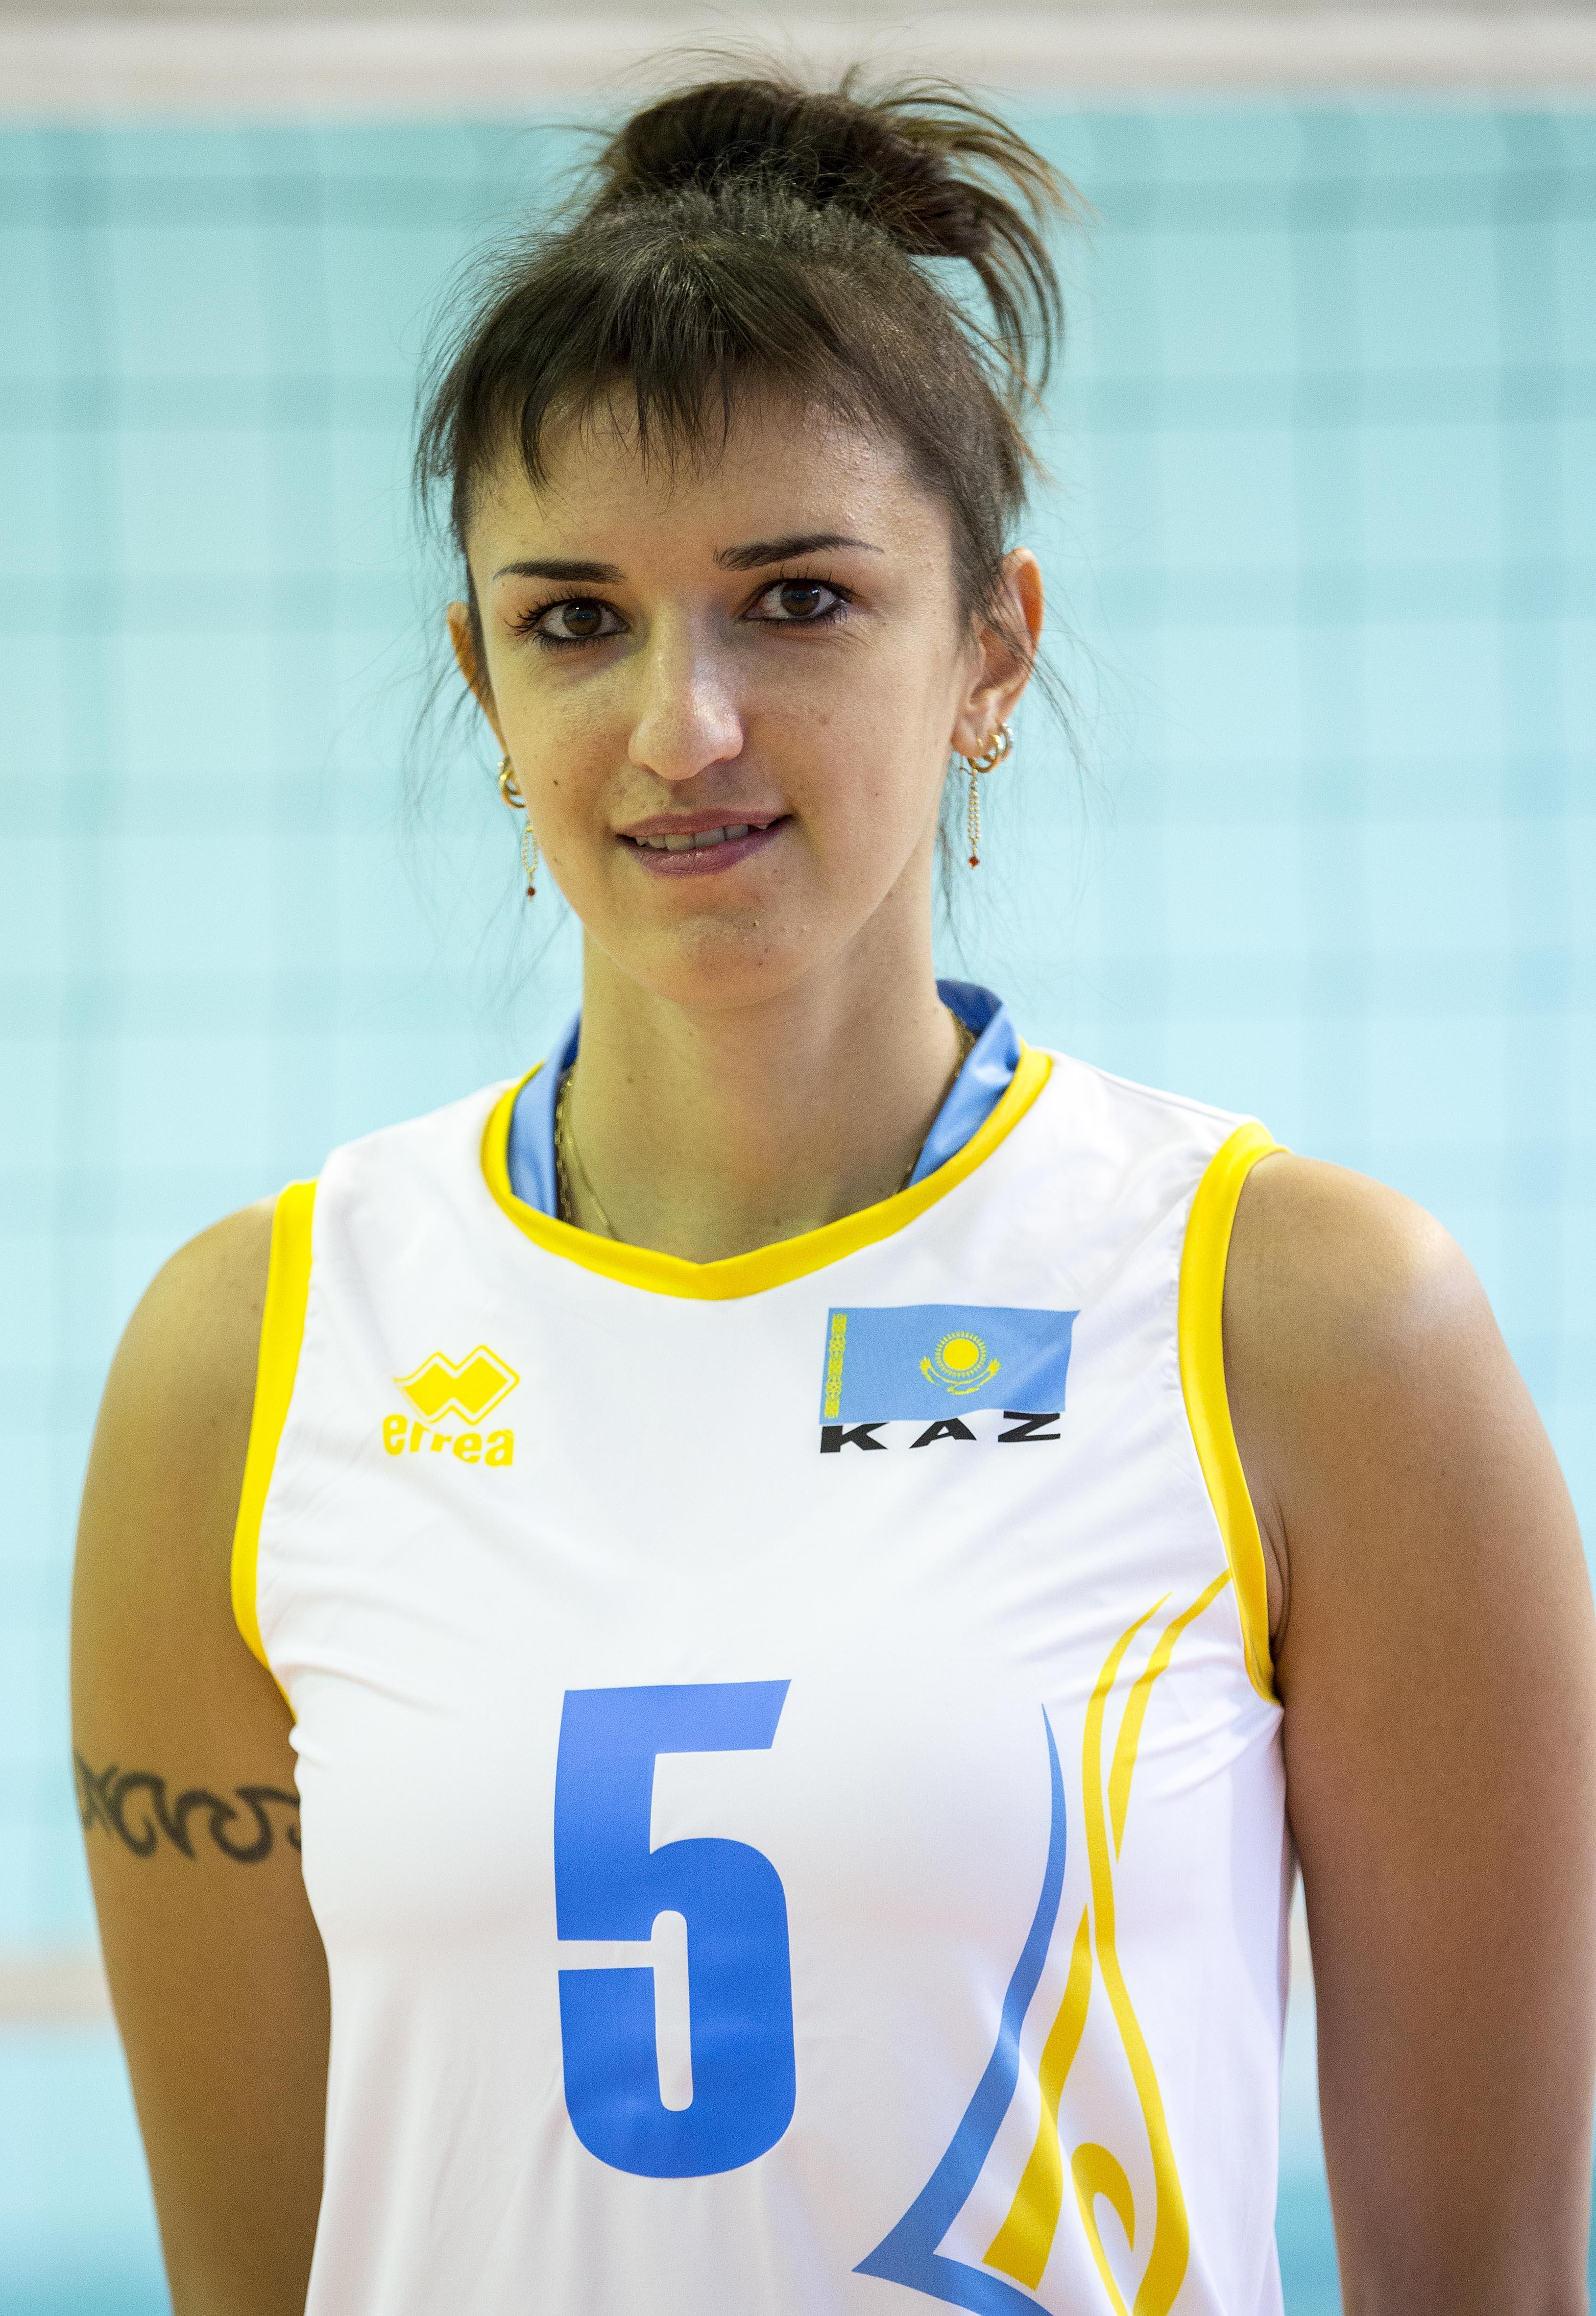 Olga Nassedkina